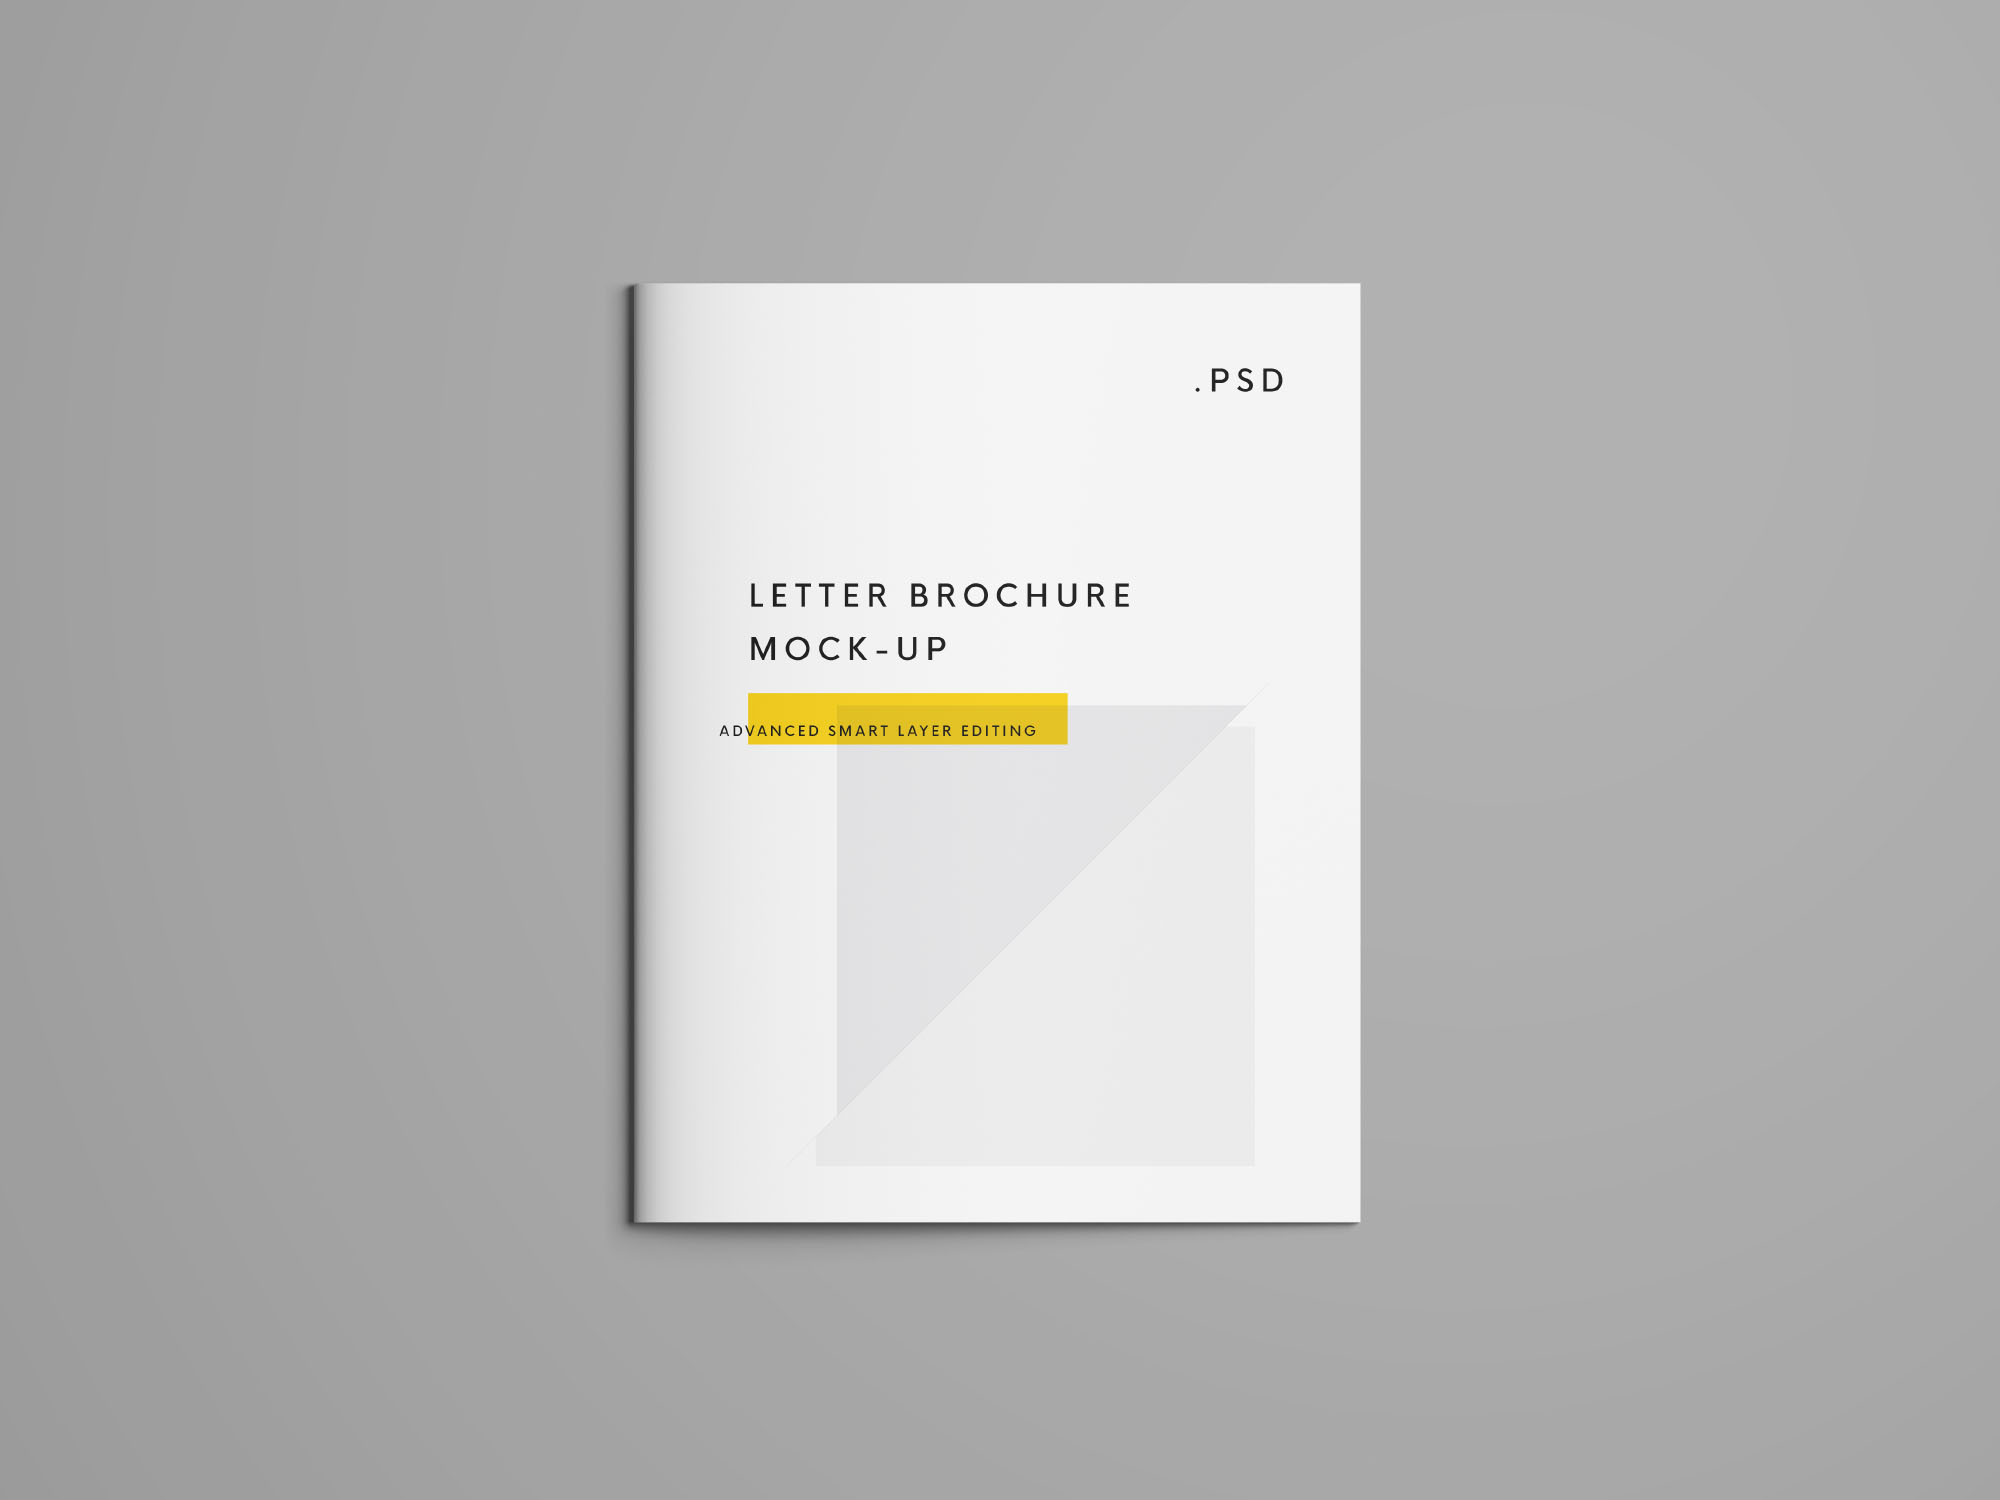 Free Us Letter Brochure Mockup Psd